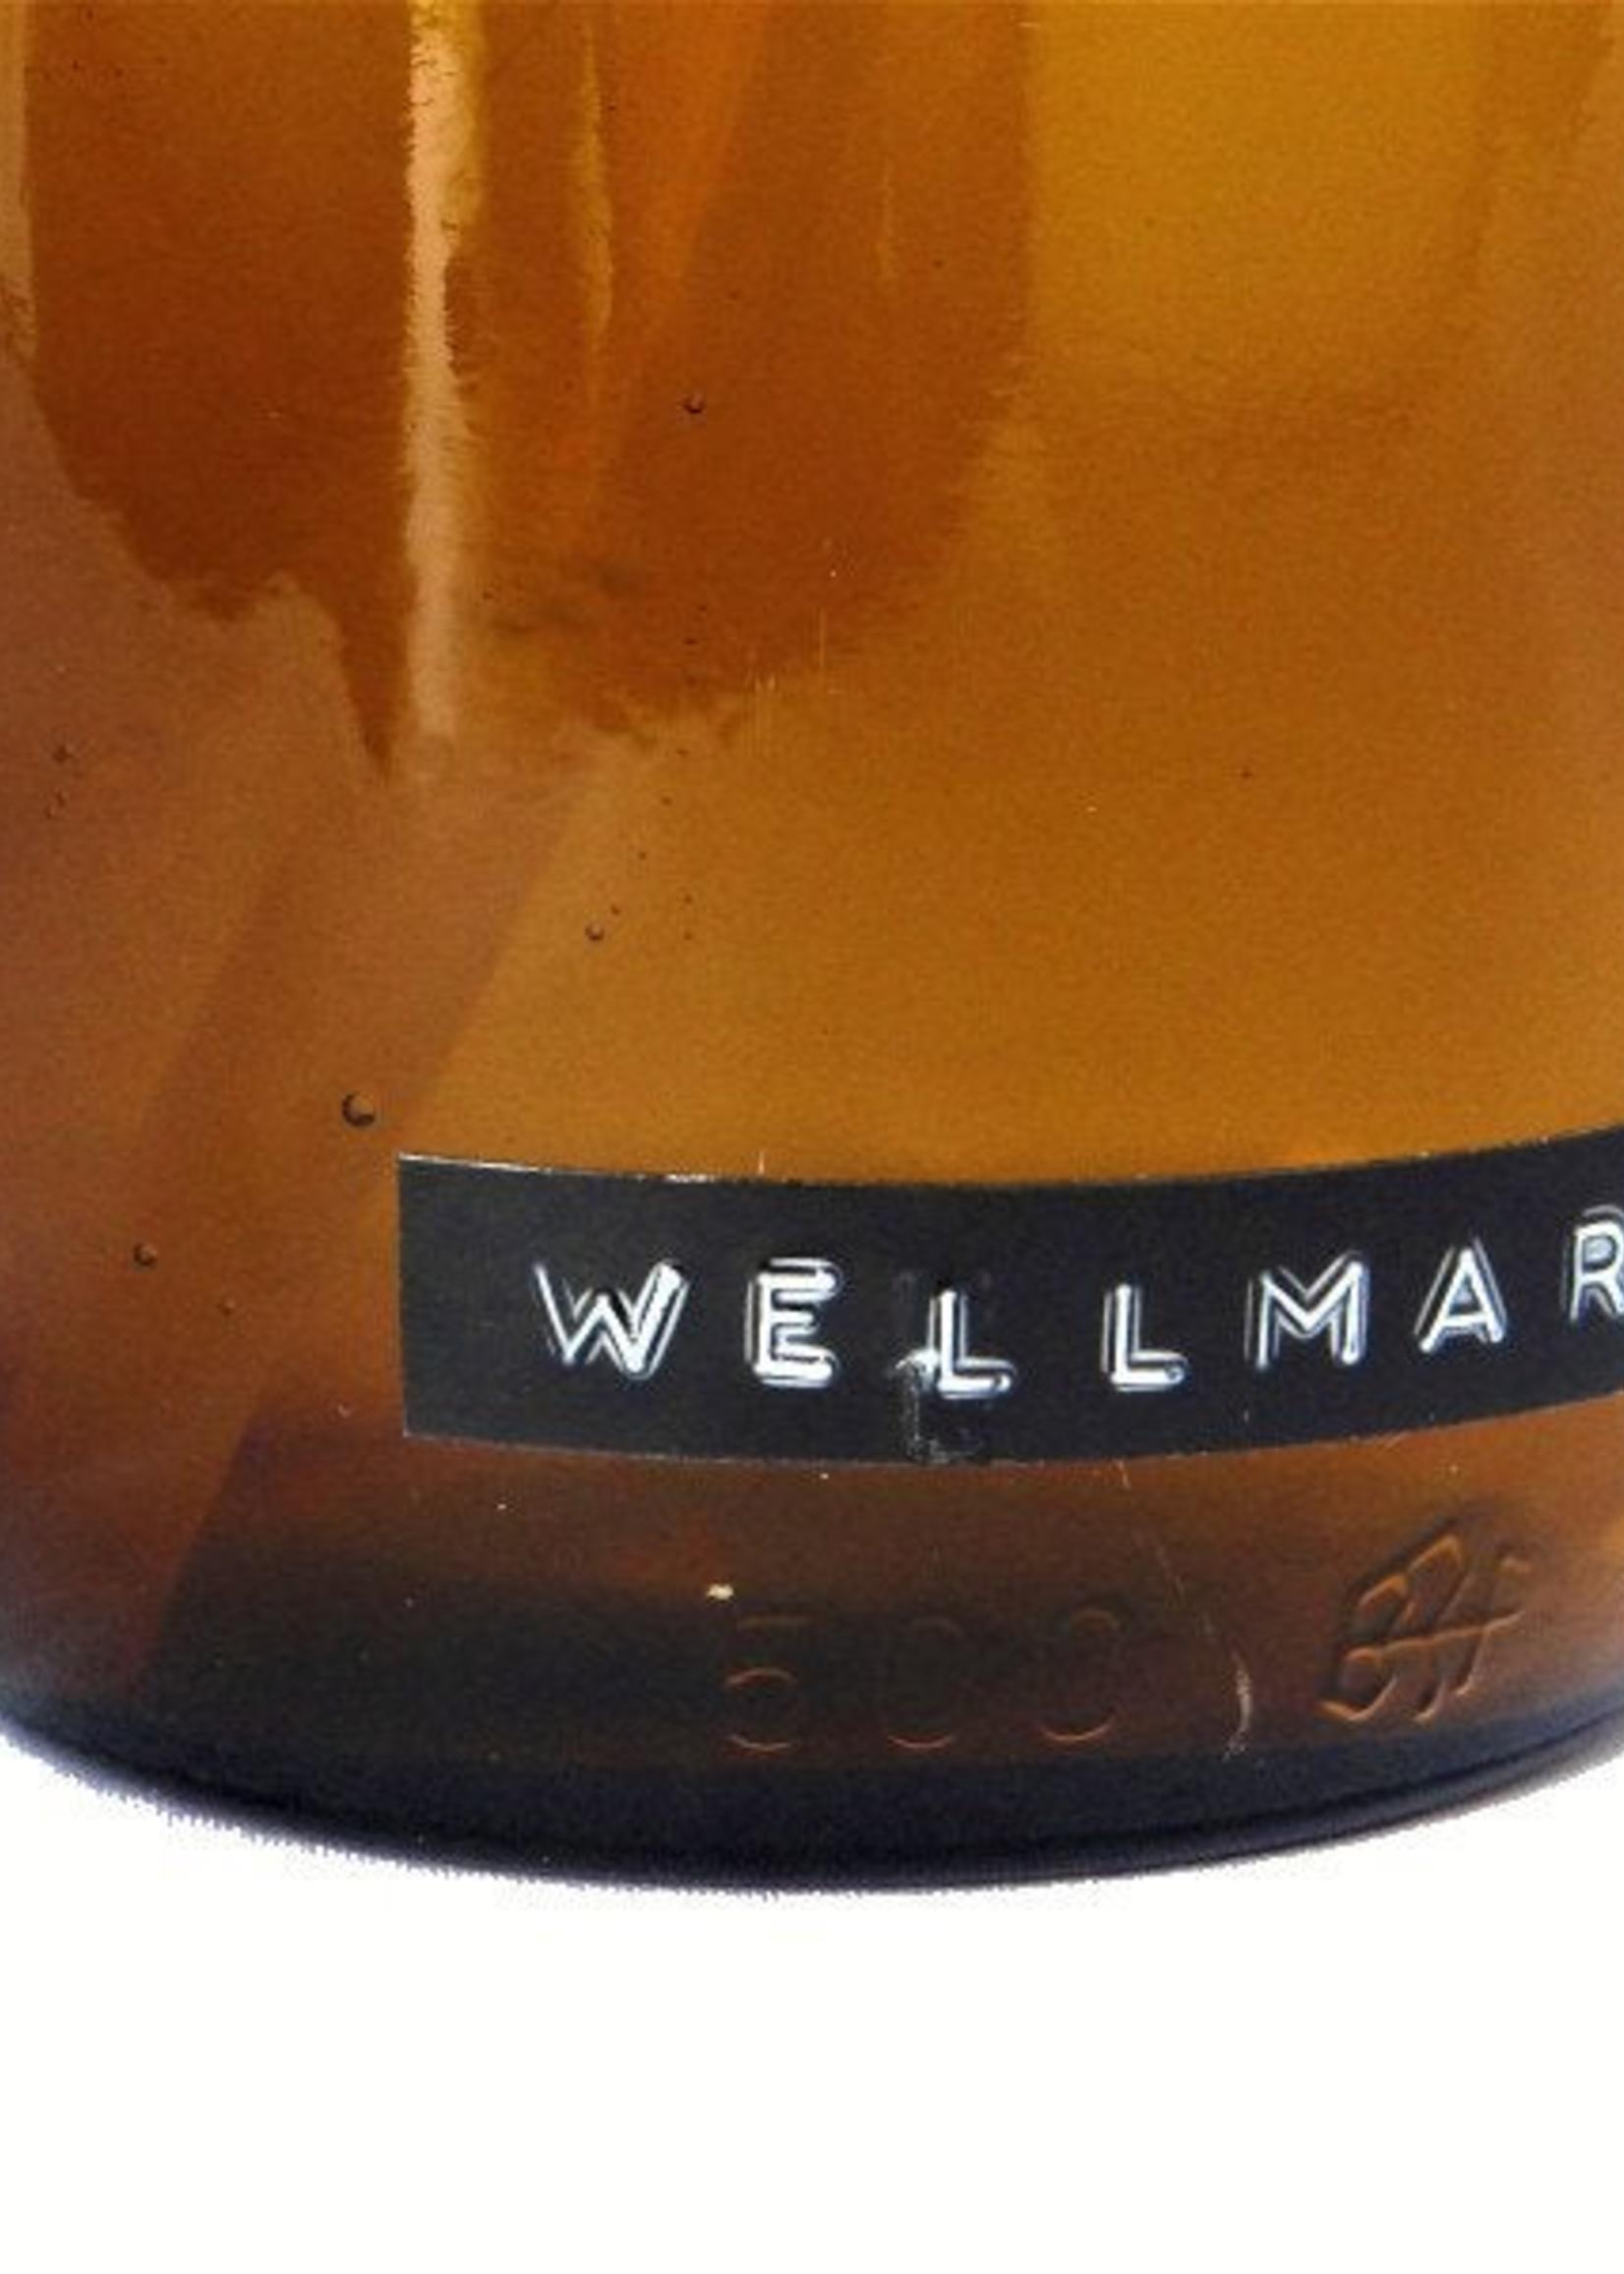 WELLmark WELLmark - Handcrème aloë vera - 250ml -  'soft hands starts here'